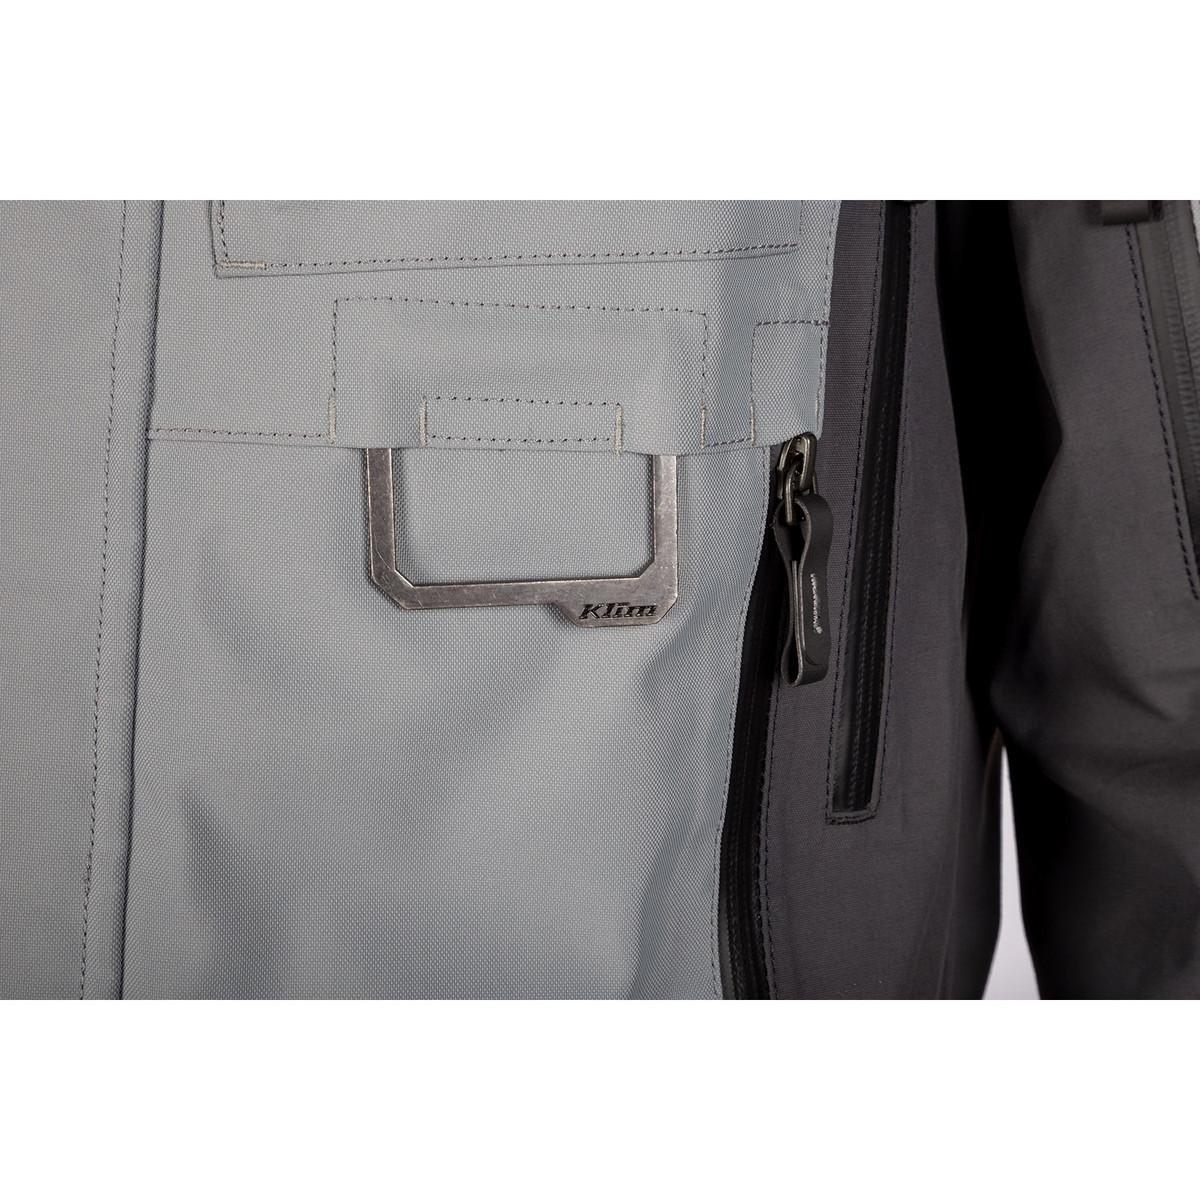 Klim Hardanger Suit Key Clip